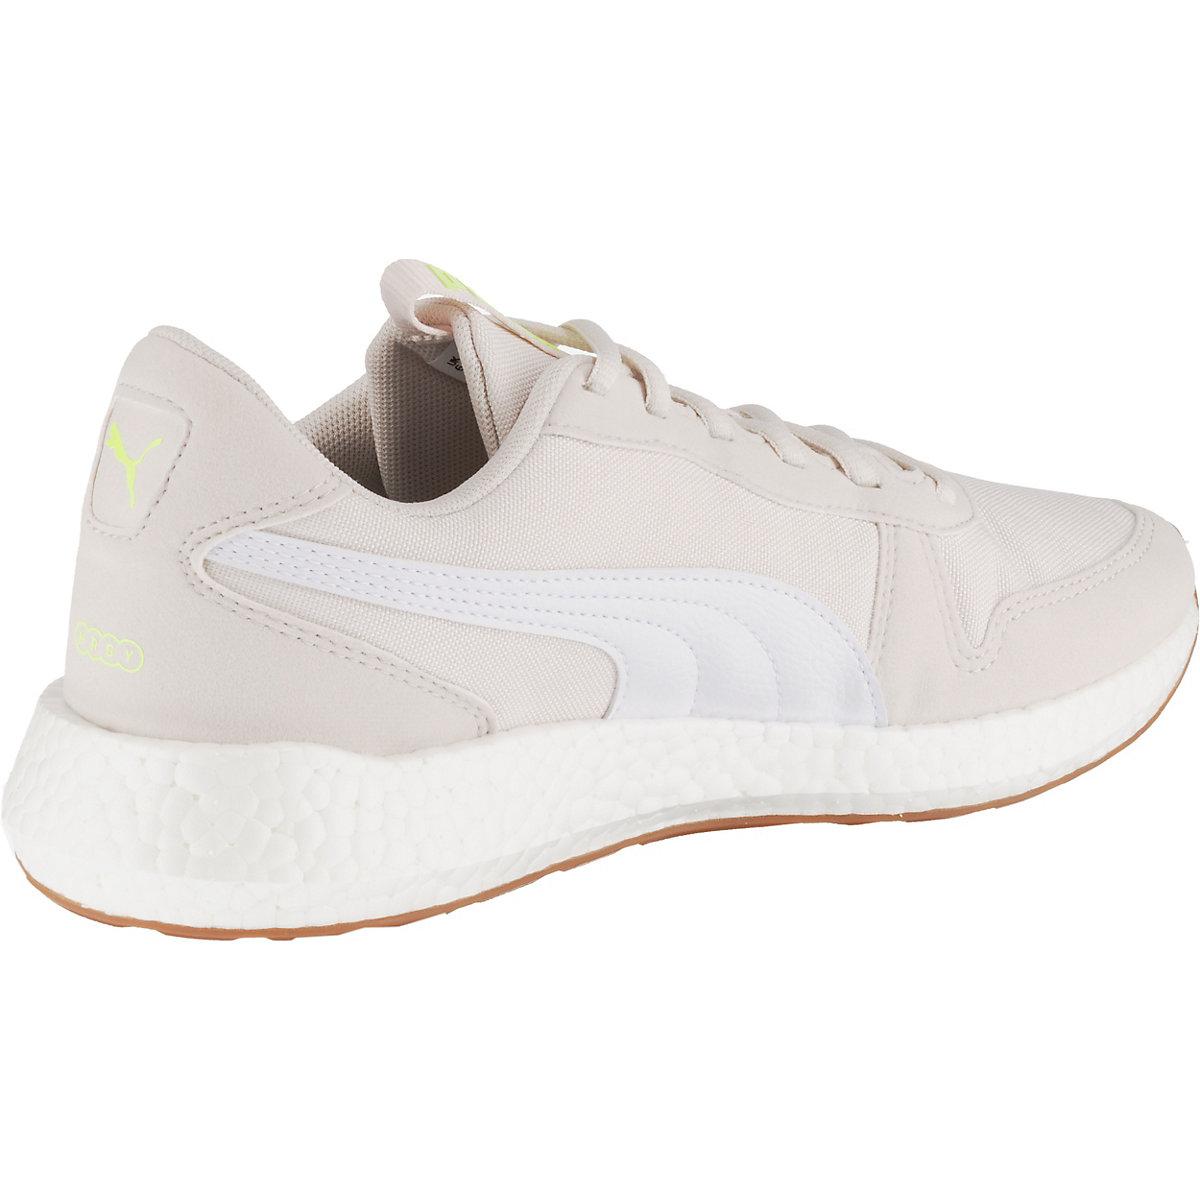 Puma, Nrgy Neko Retro Sneakers Low, Creme